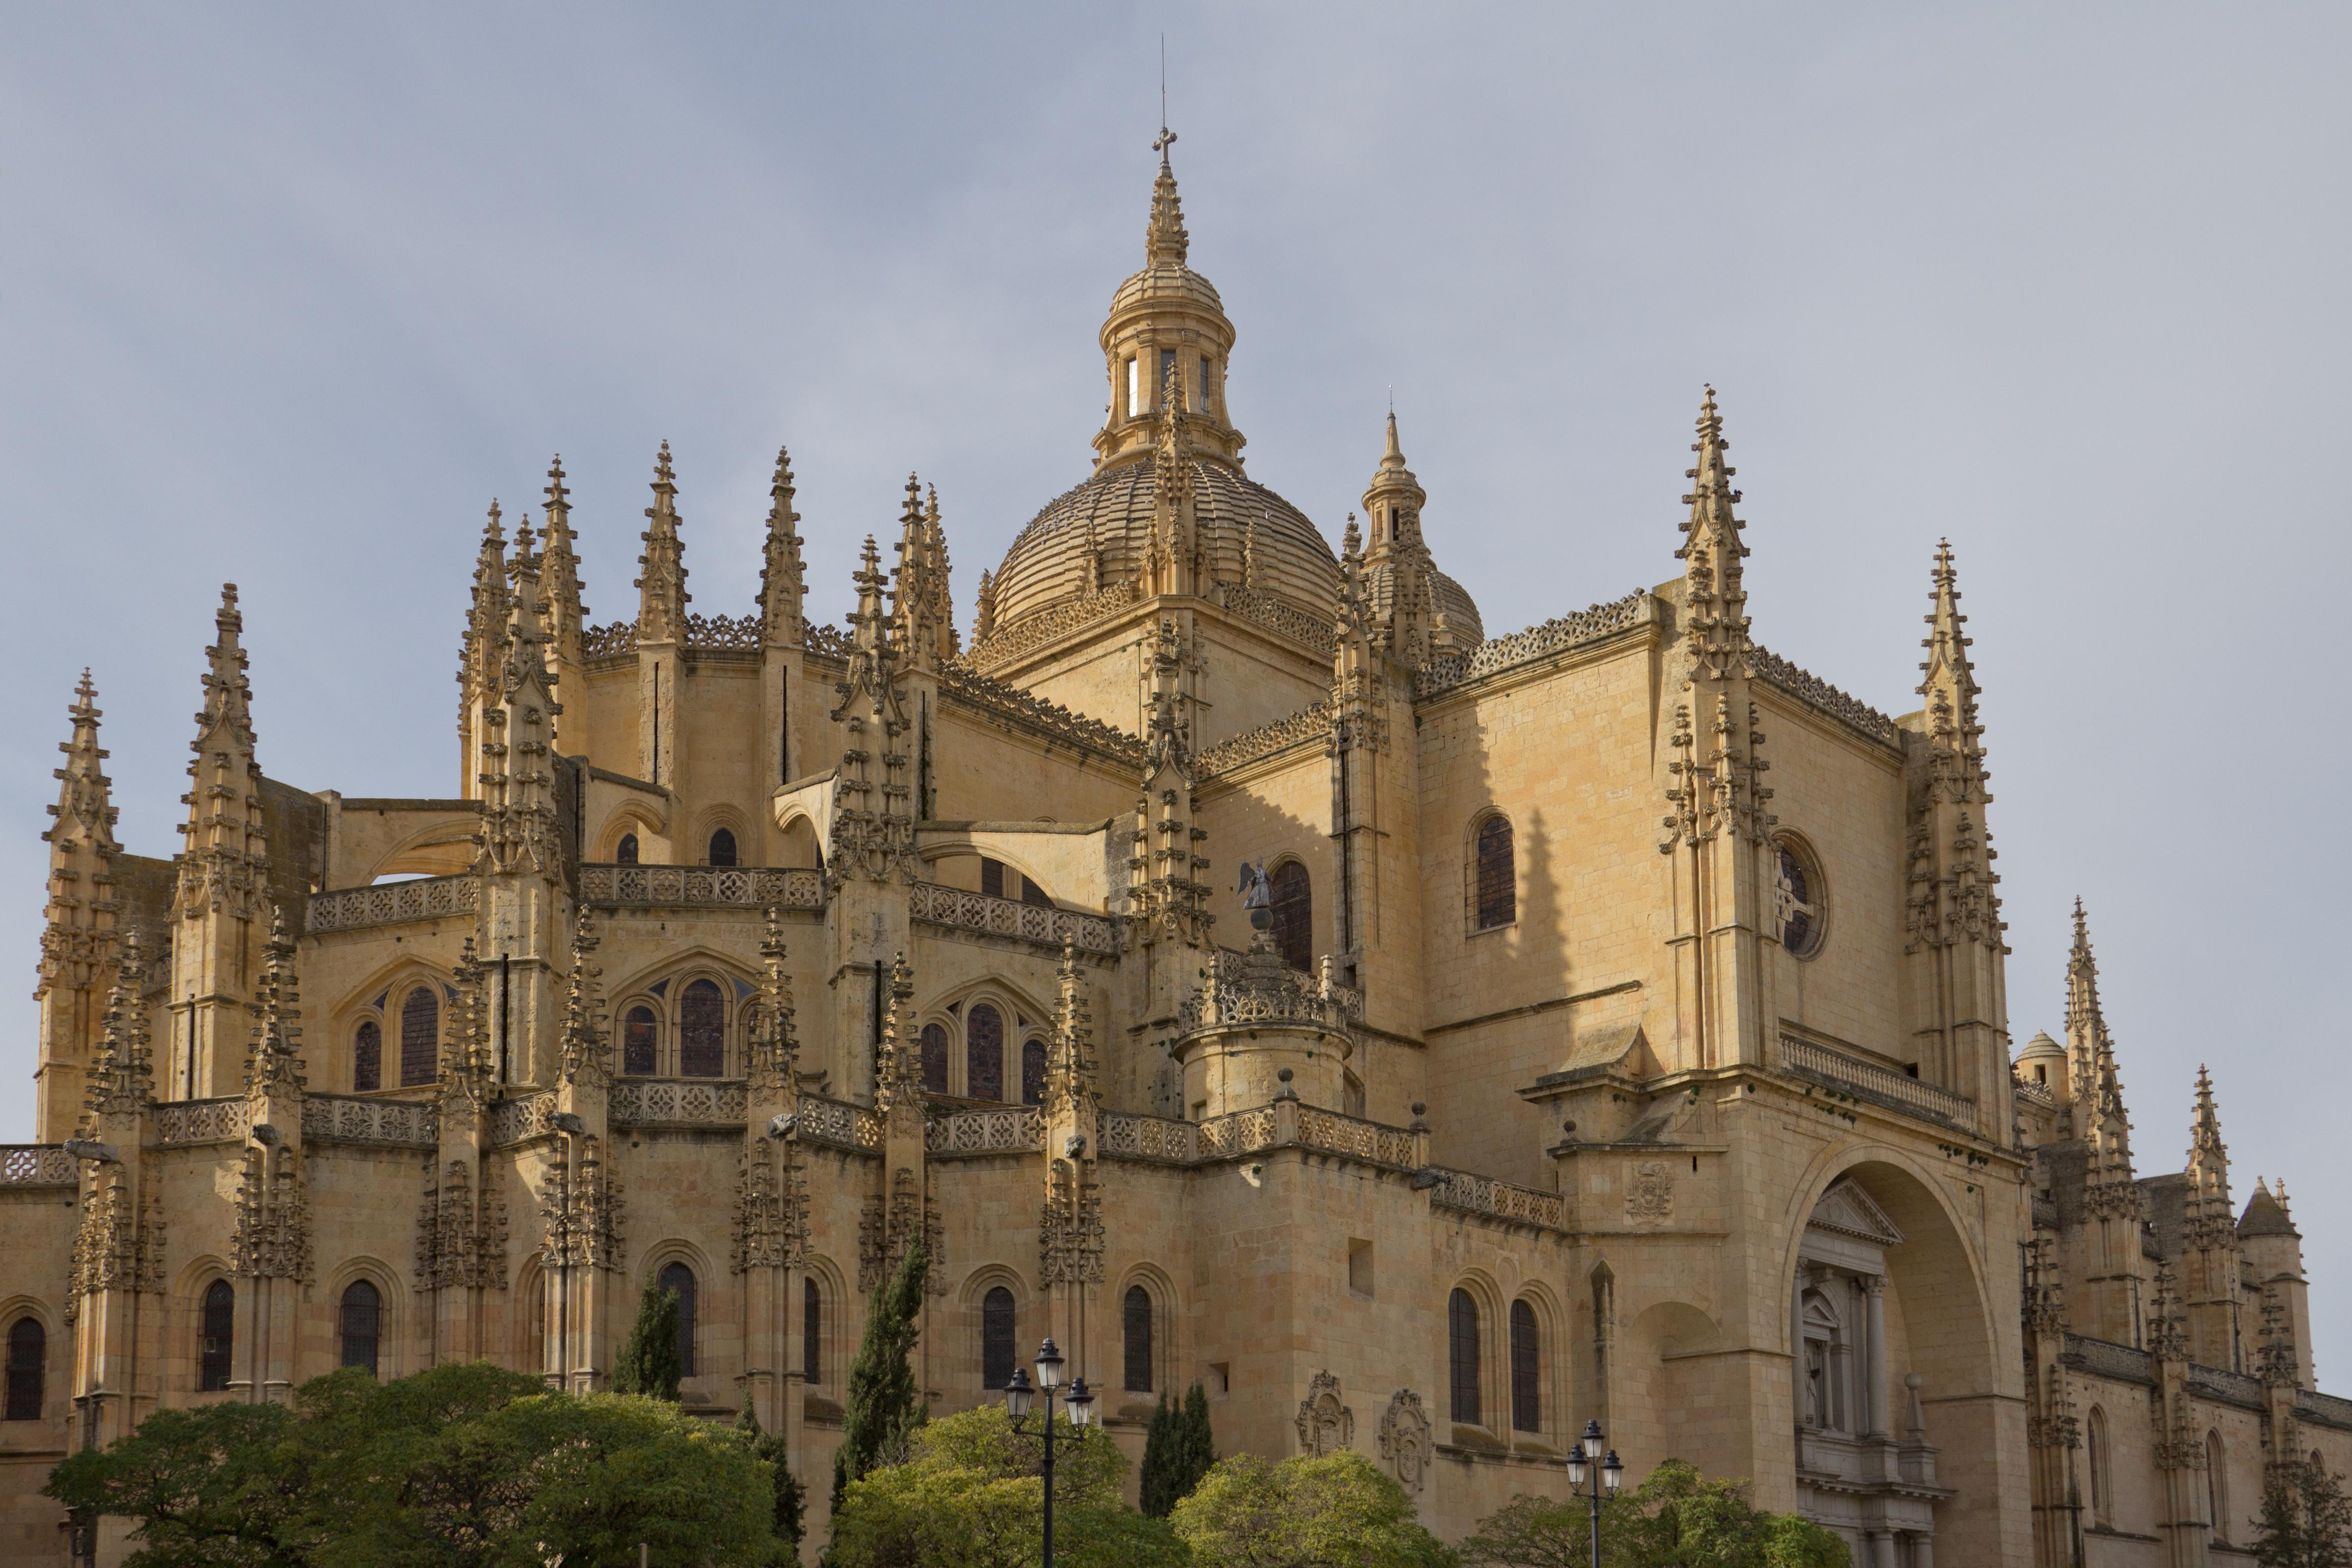 File:Catedral de Santa María de Segovia - 04.jpg - Wikimedia Commons